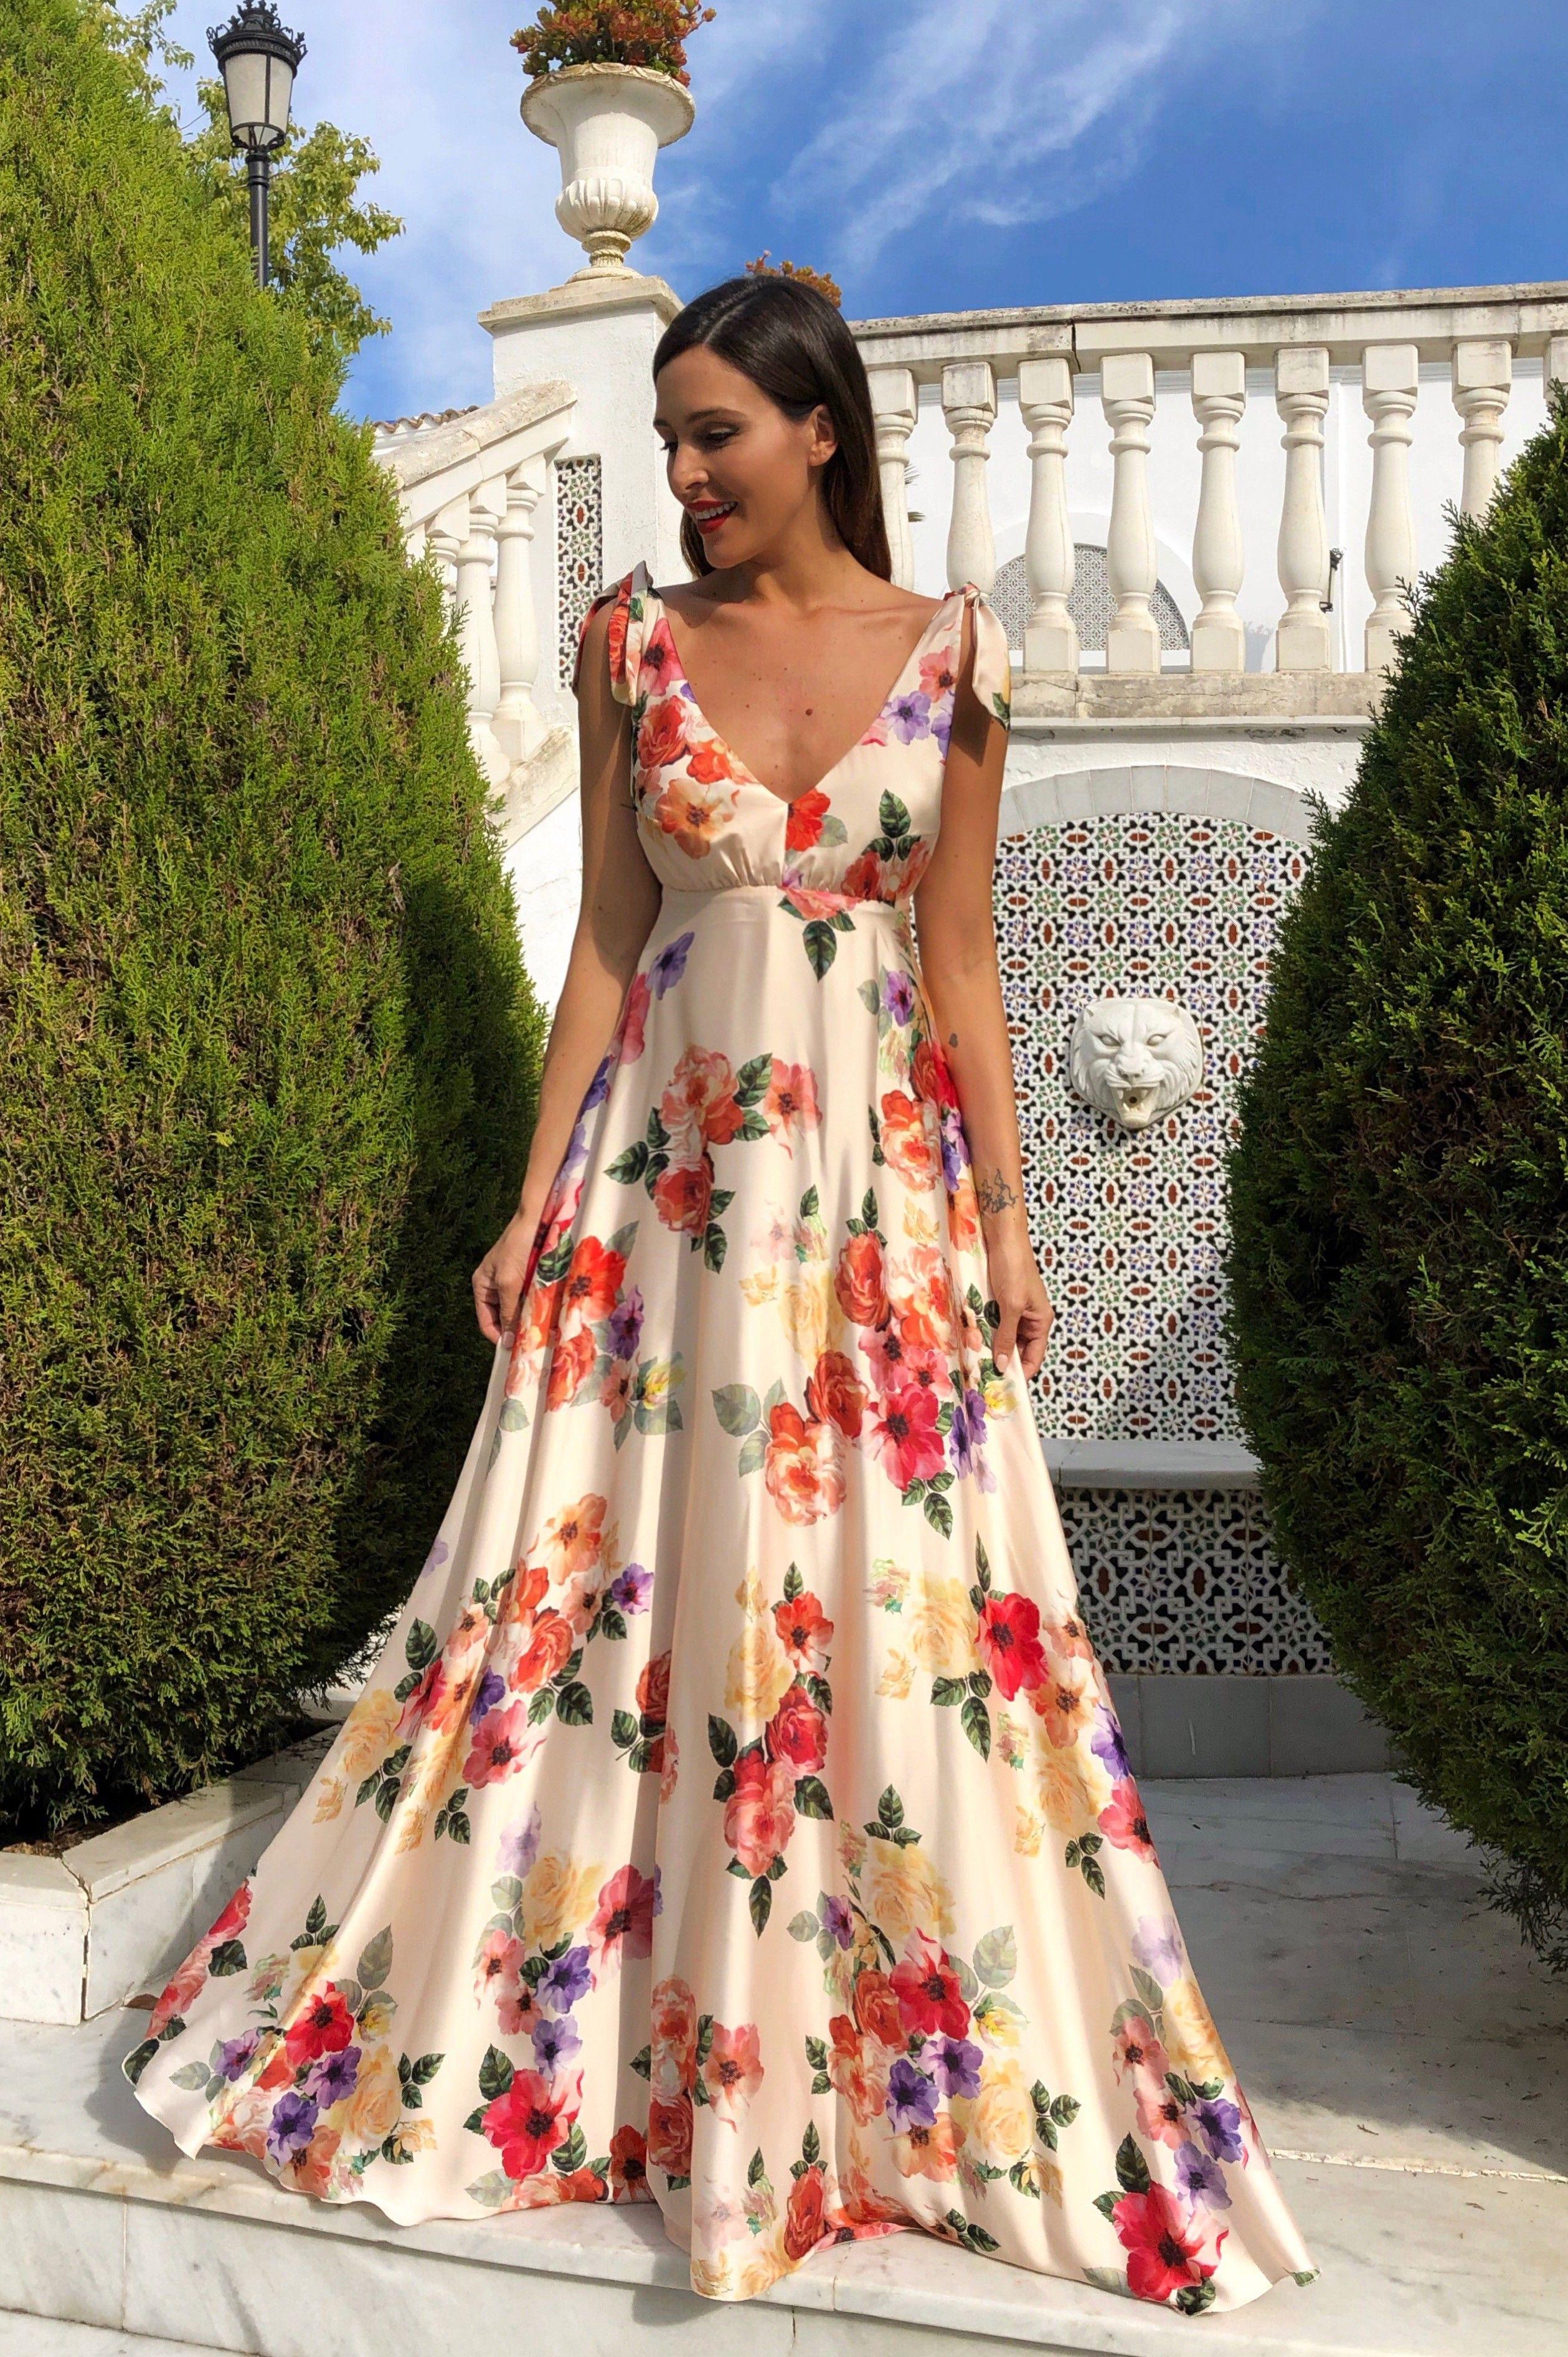 Vestido Alba Crudo Rocío Osorno Diseñadora De Moda Sevilla Vestidos Para Boda En Playa Invitada Vestidos Largos Florales Vestidos Largos De Dia